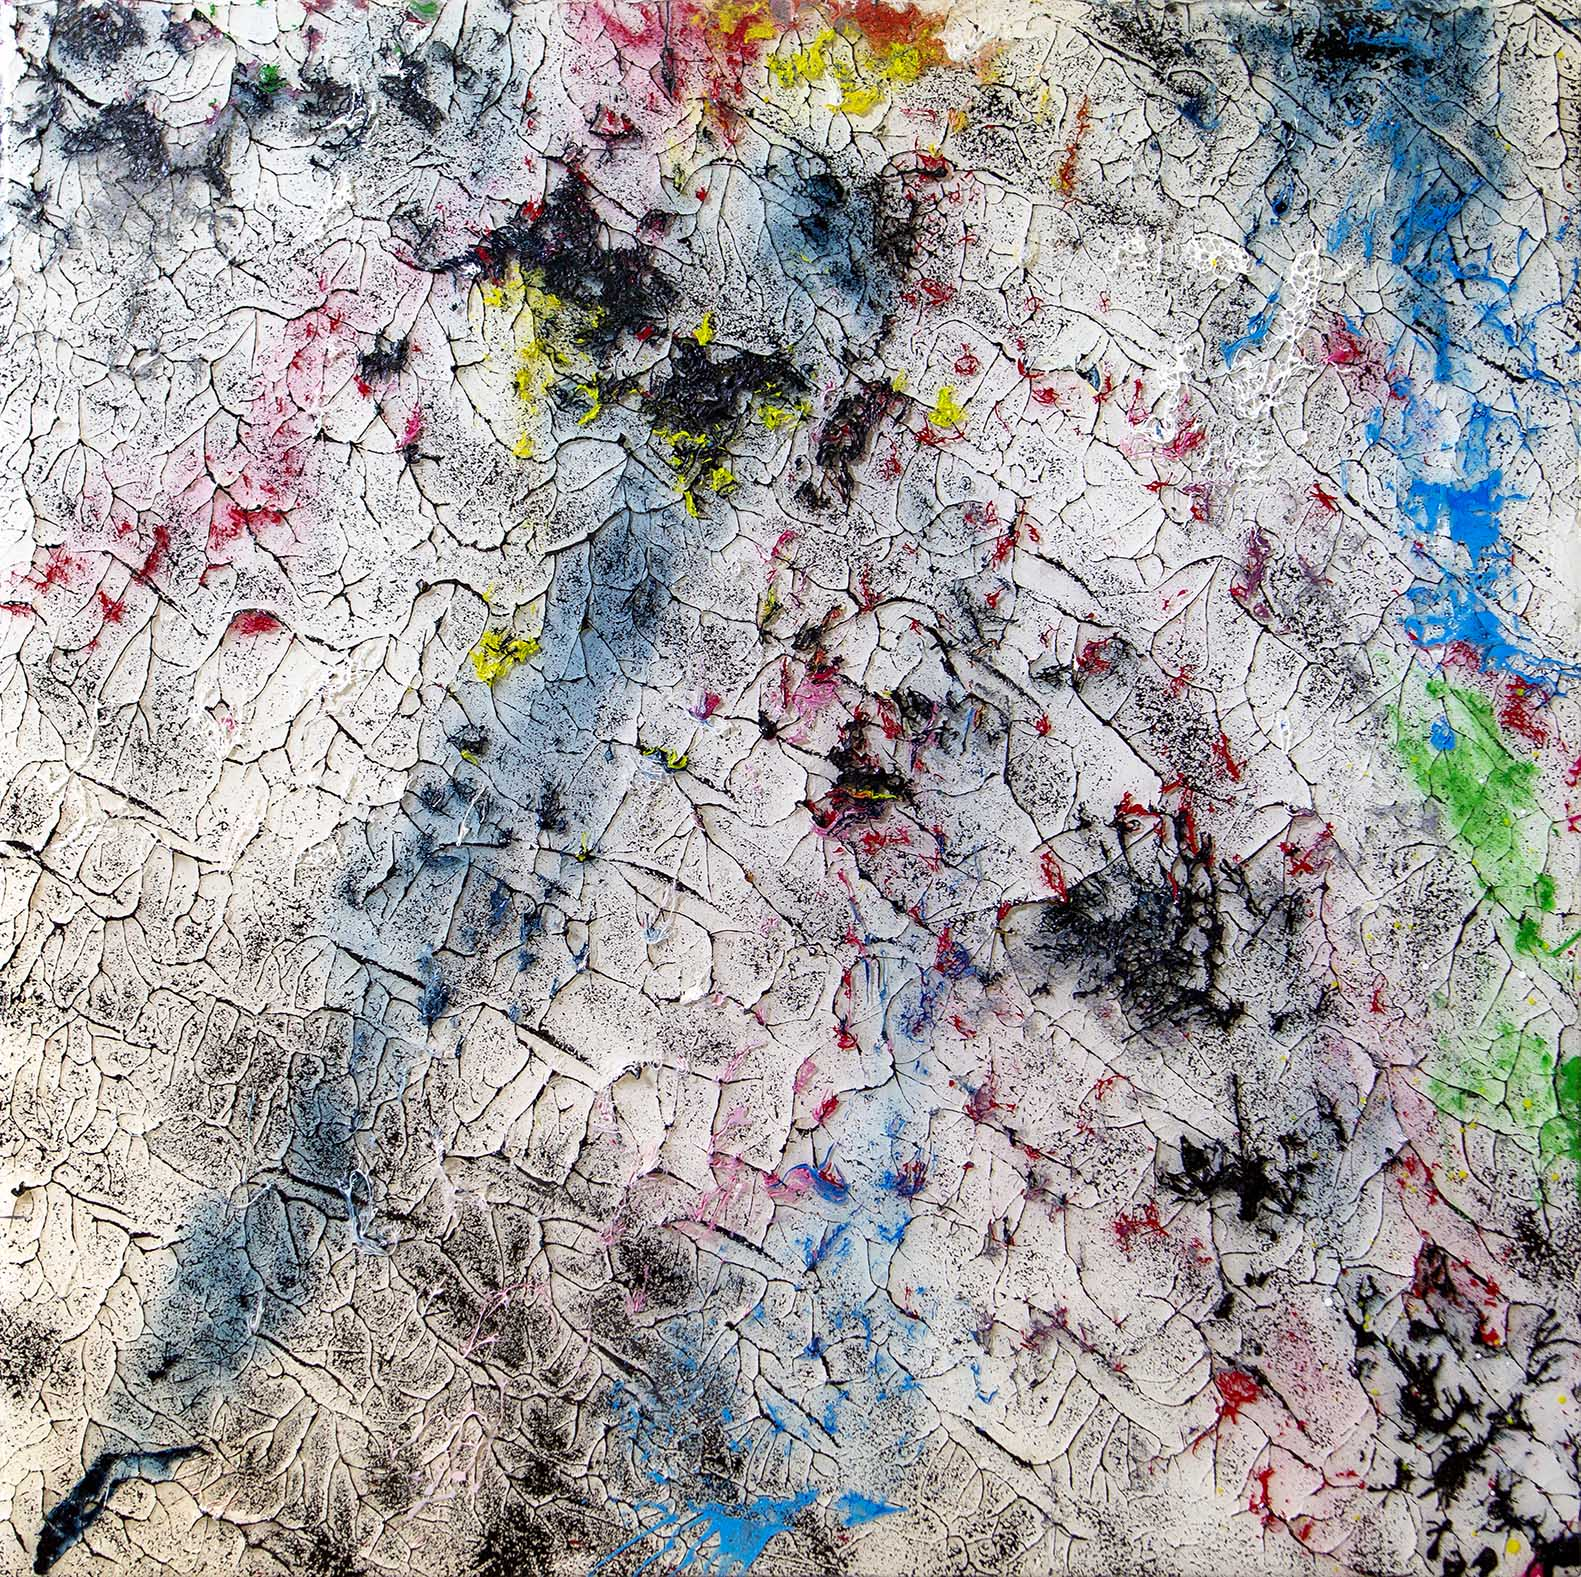 Untitled (C2201724)